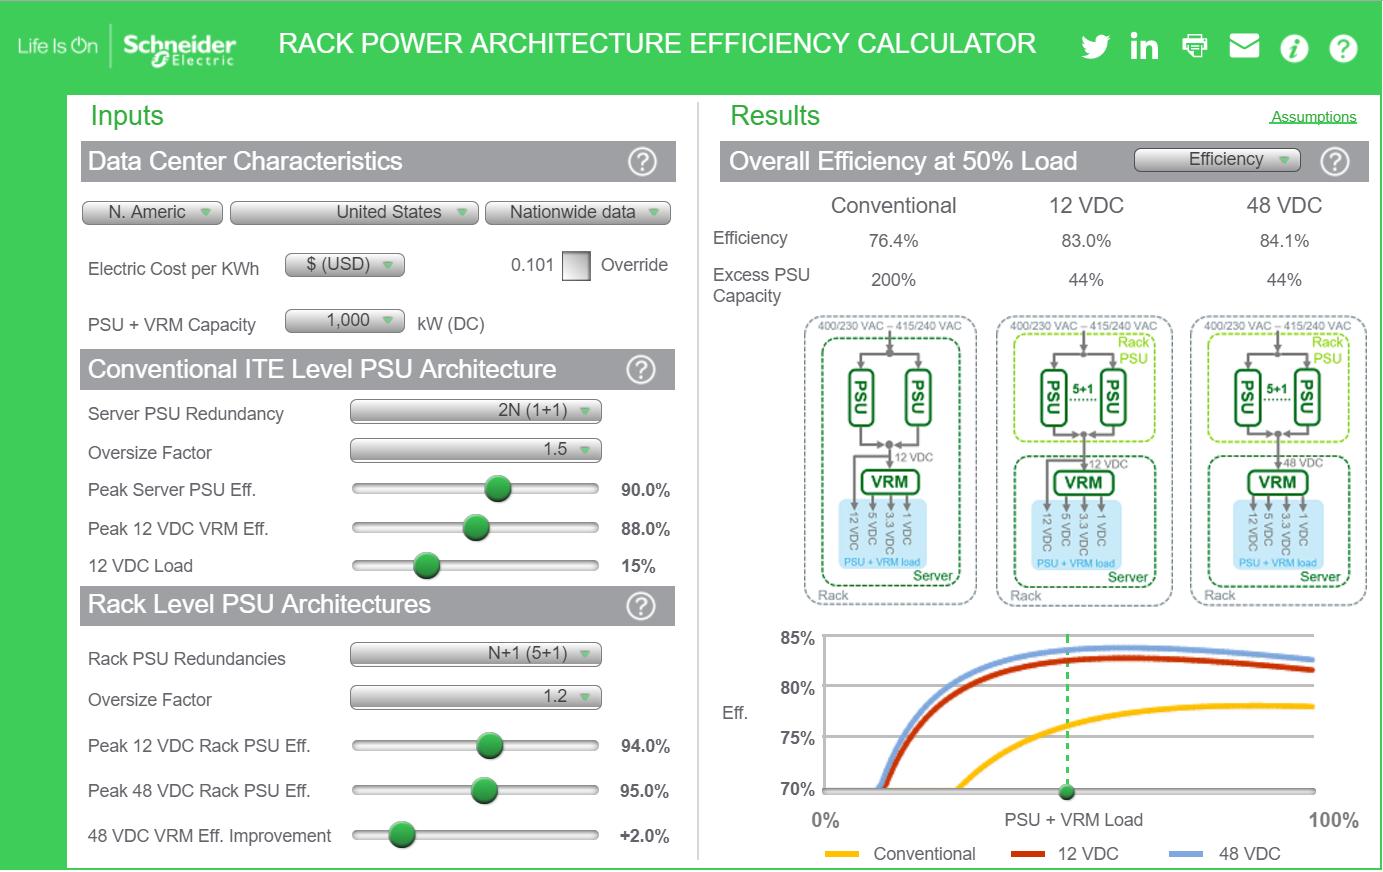 Rack Power Architecture Efficiency Calculator